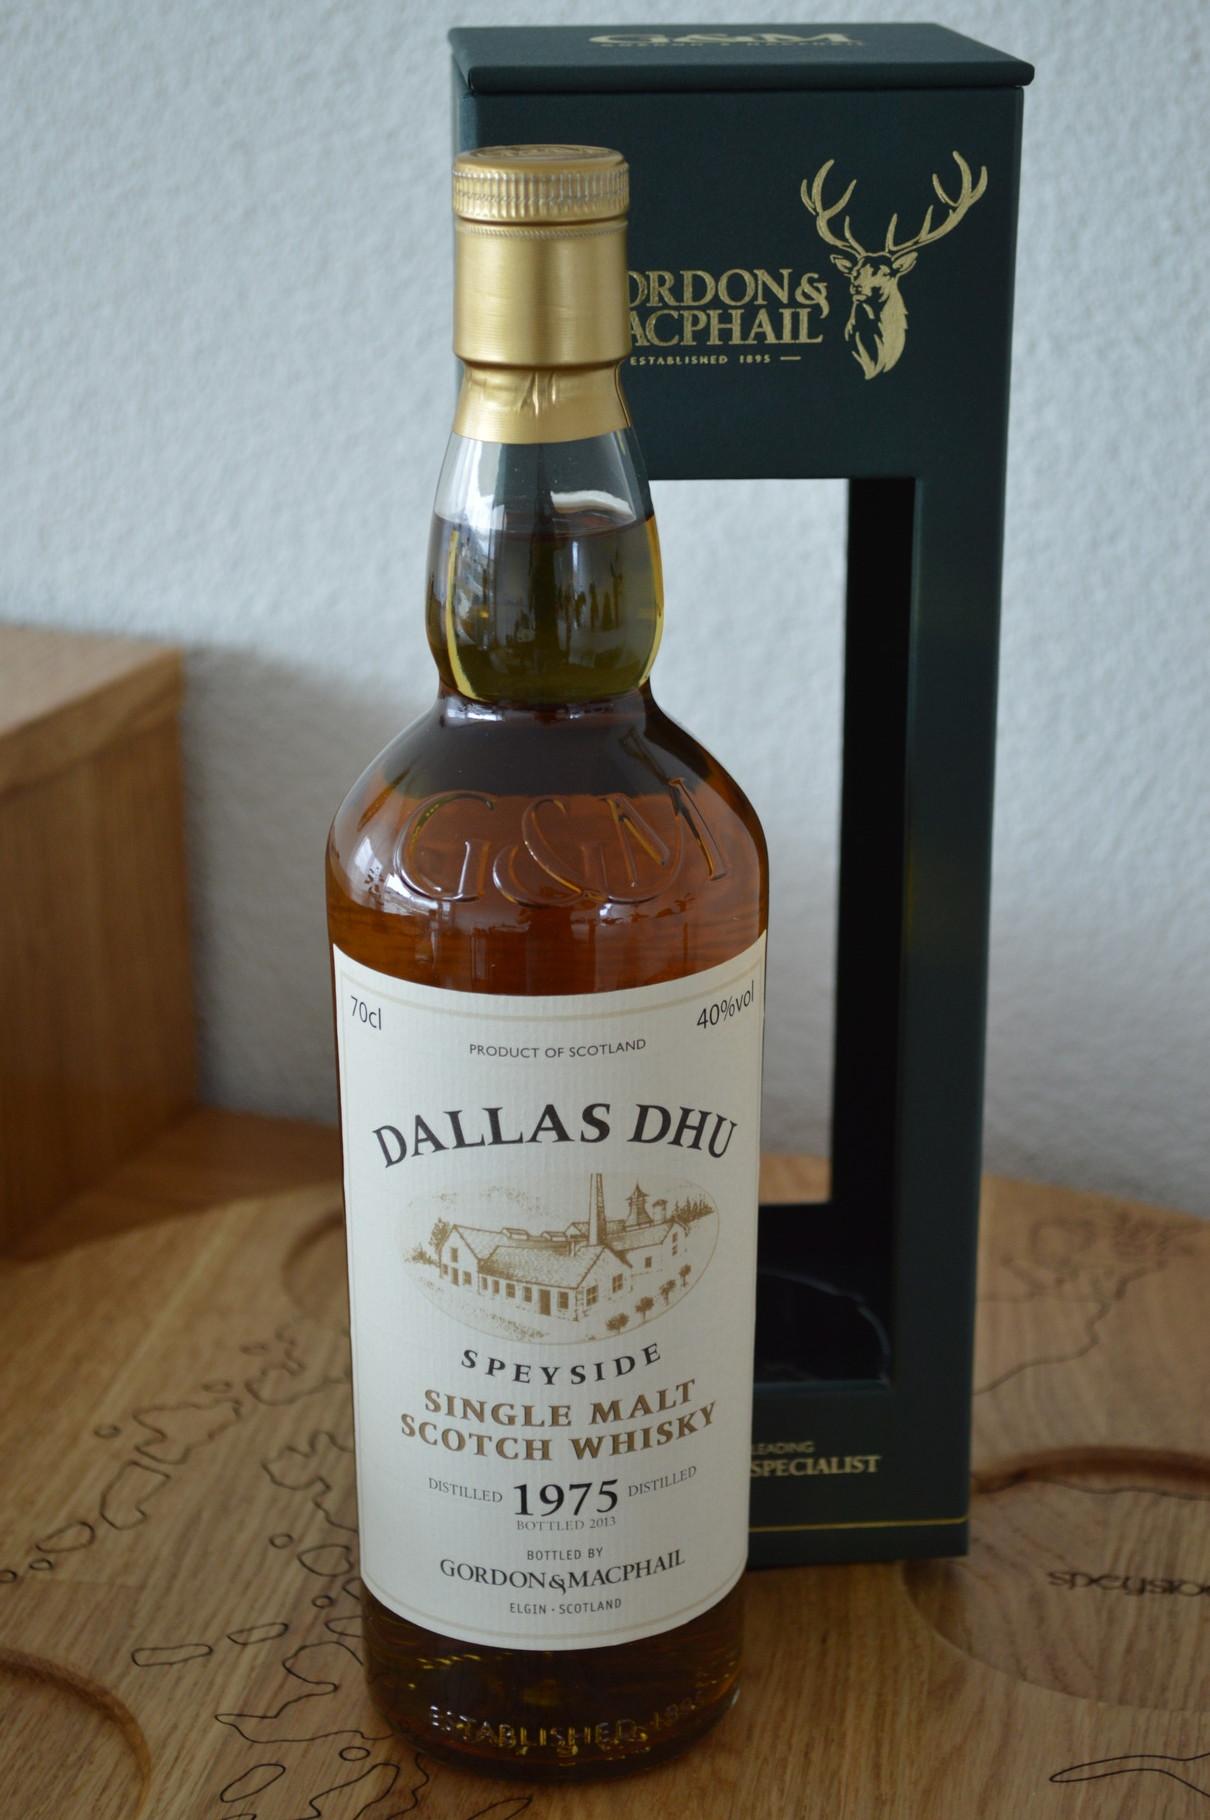 SPEYSIDE - Dallas Dhu* - Aged: 38 years - Bottler: Gordon & Macphail - 70cl - 40.0%